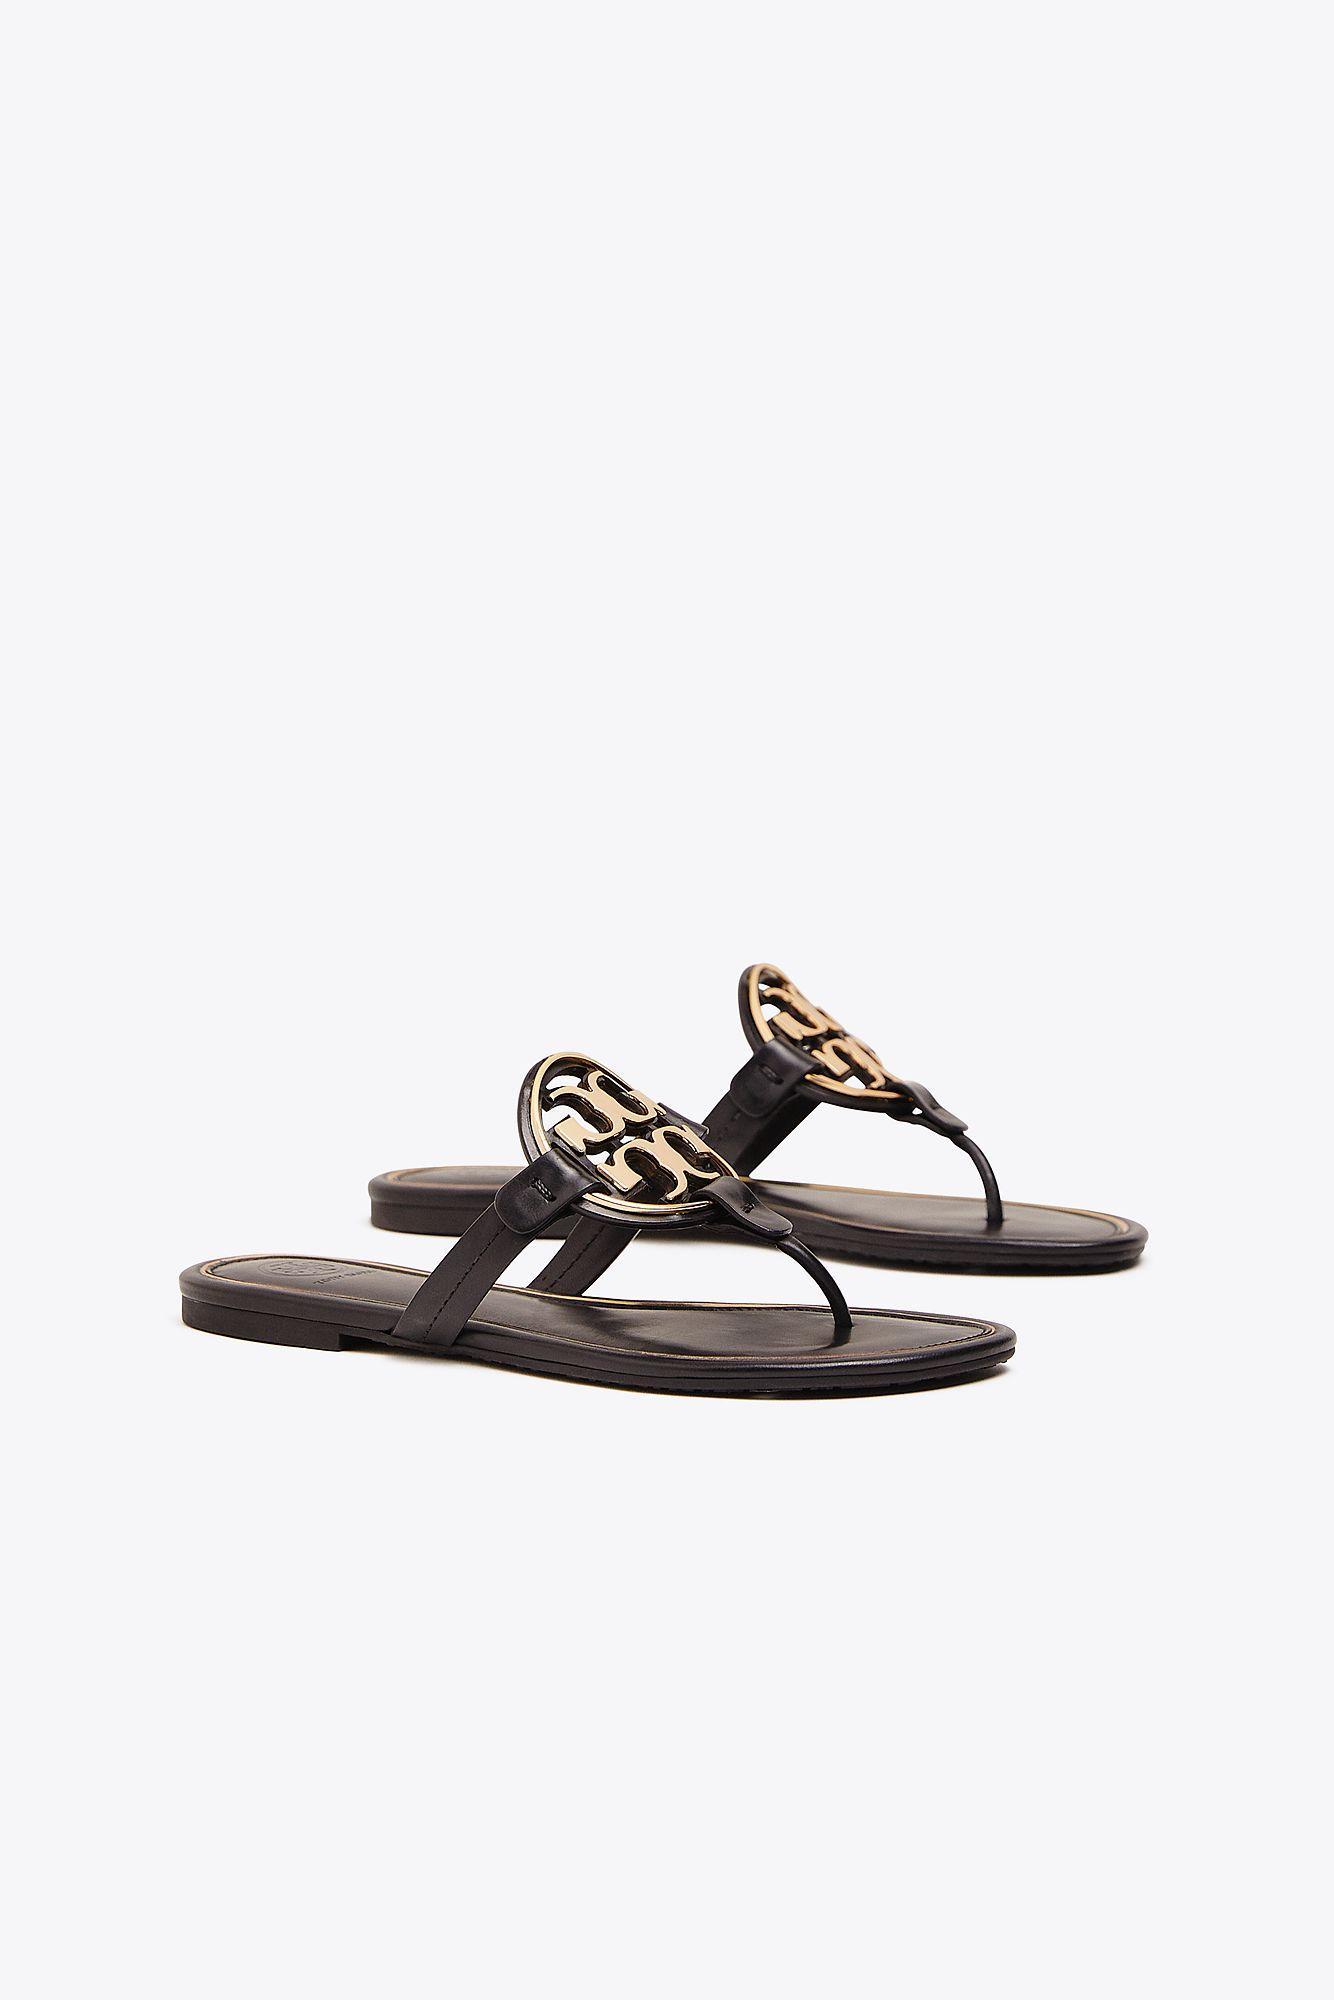 79ab58d19d9bf Tory Burch - Black Miller Flat Metal Logo Slide Sandals - Lyst. View  fullscreen